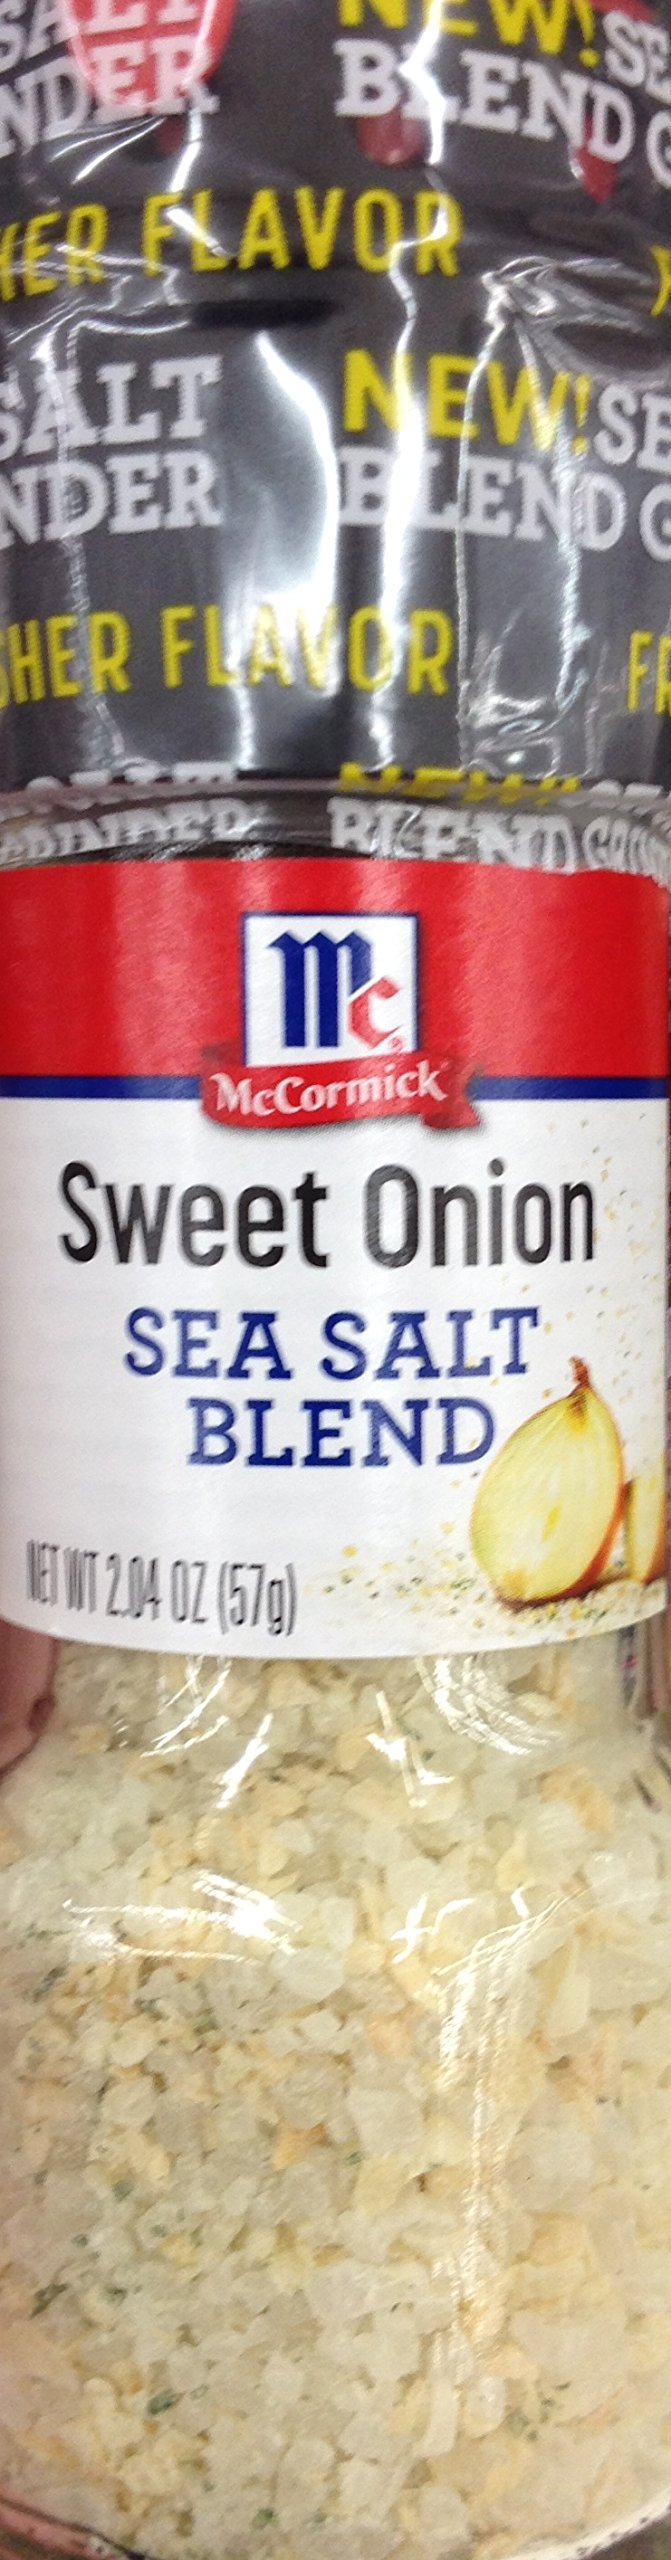 McCormick SWEET ONION Sea Salt Blend GRINDER 2.04oz (5 Pack)